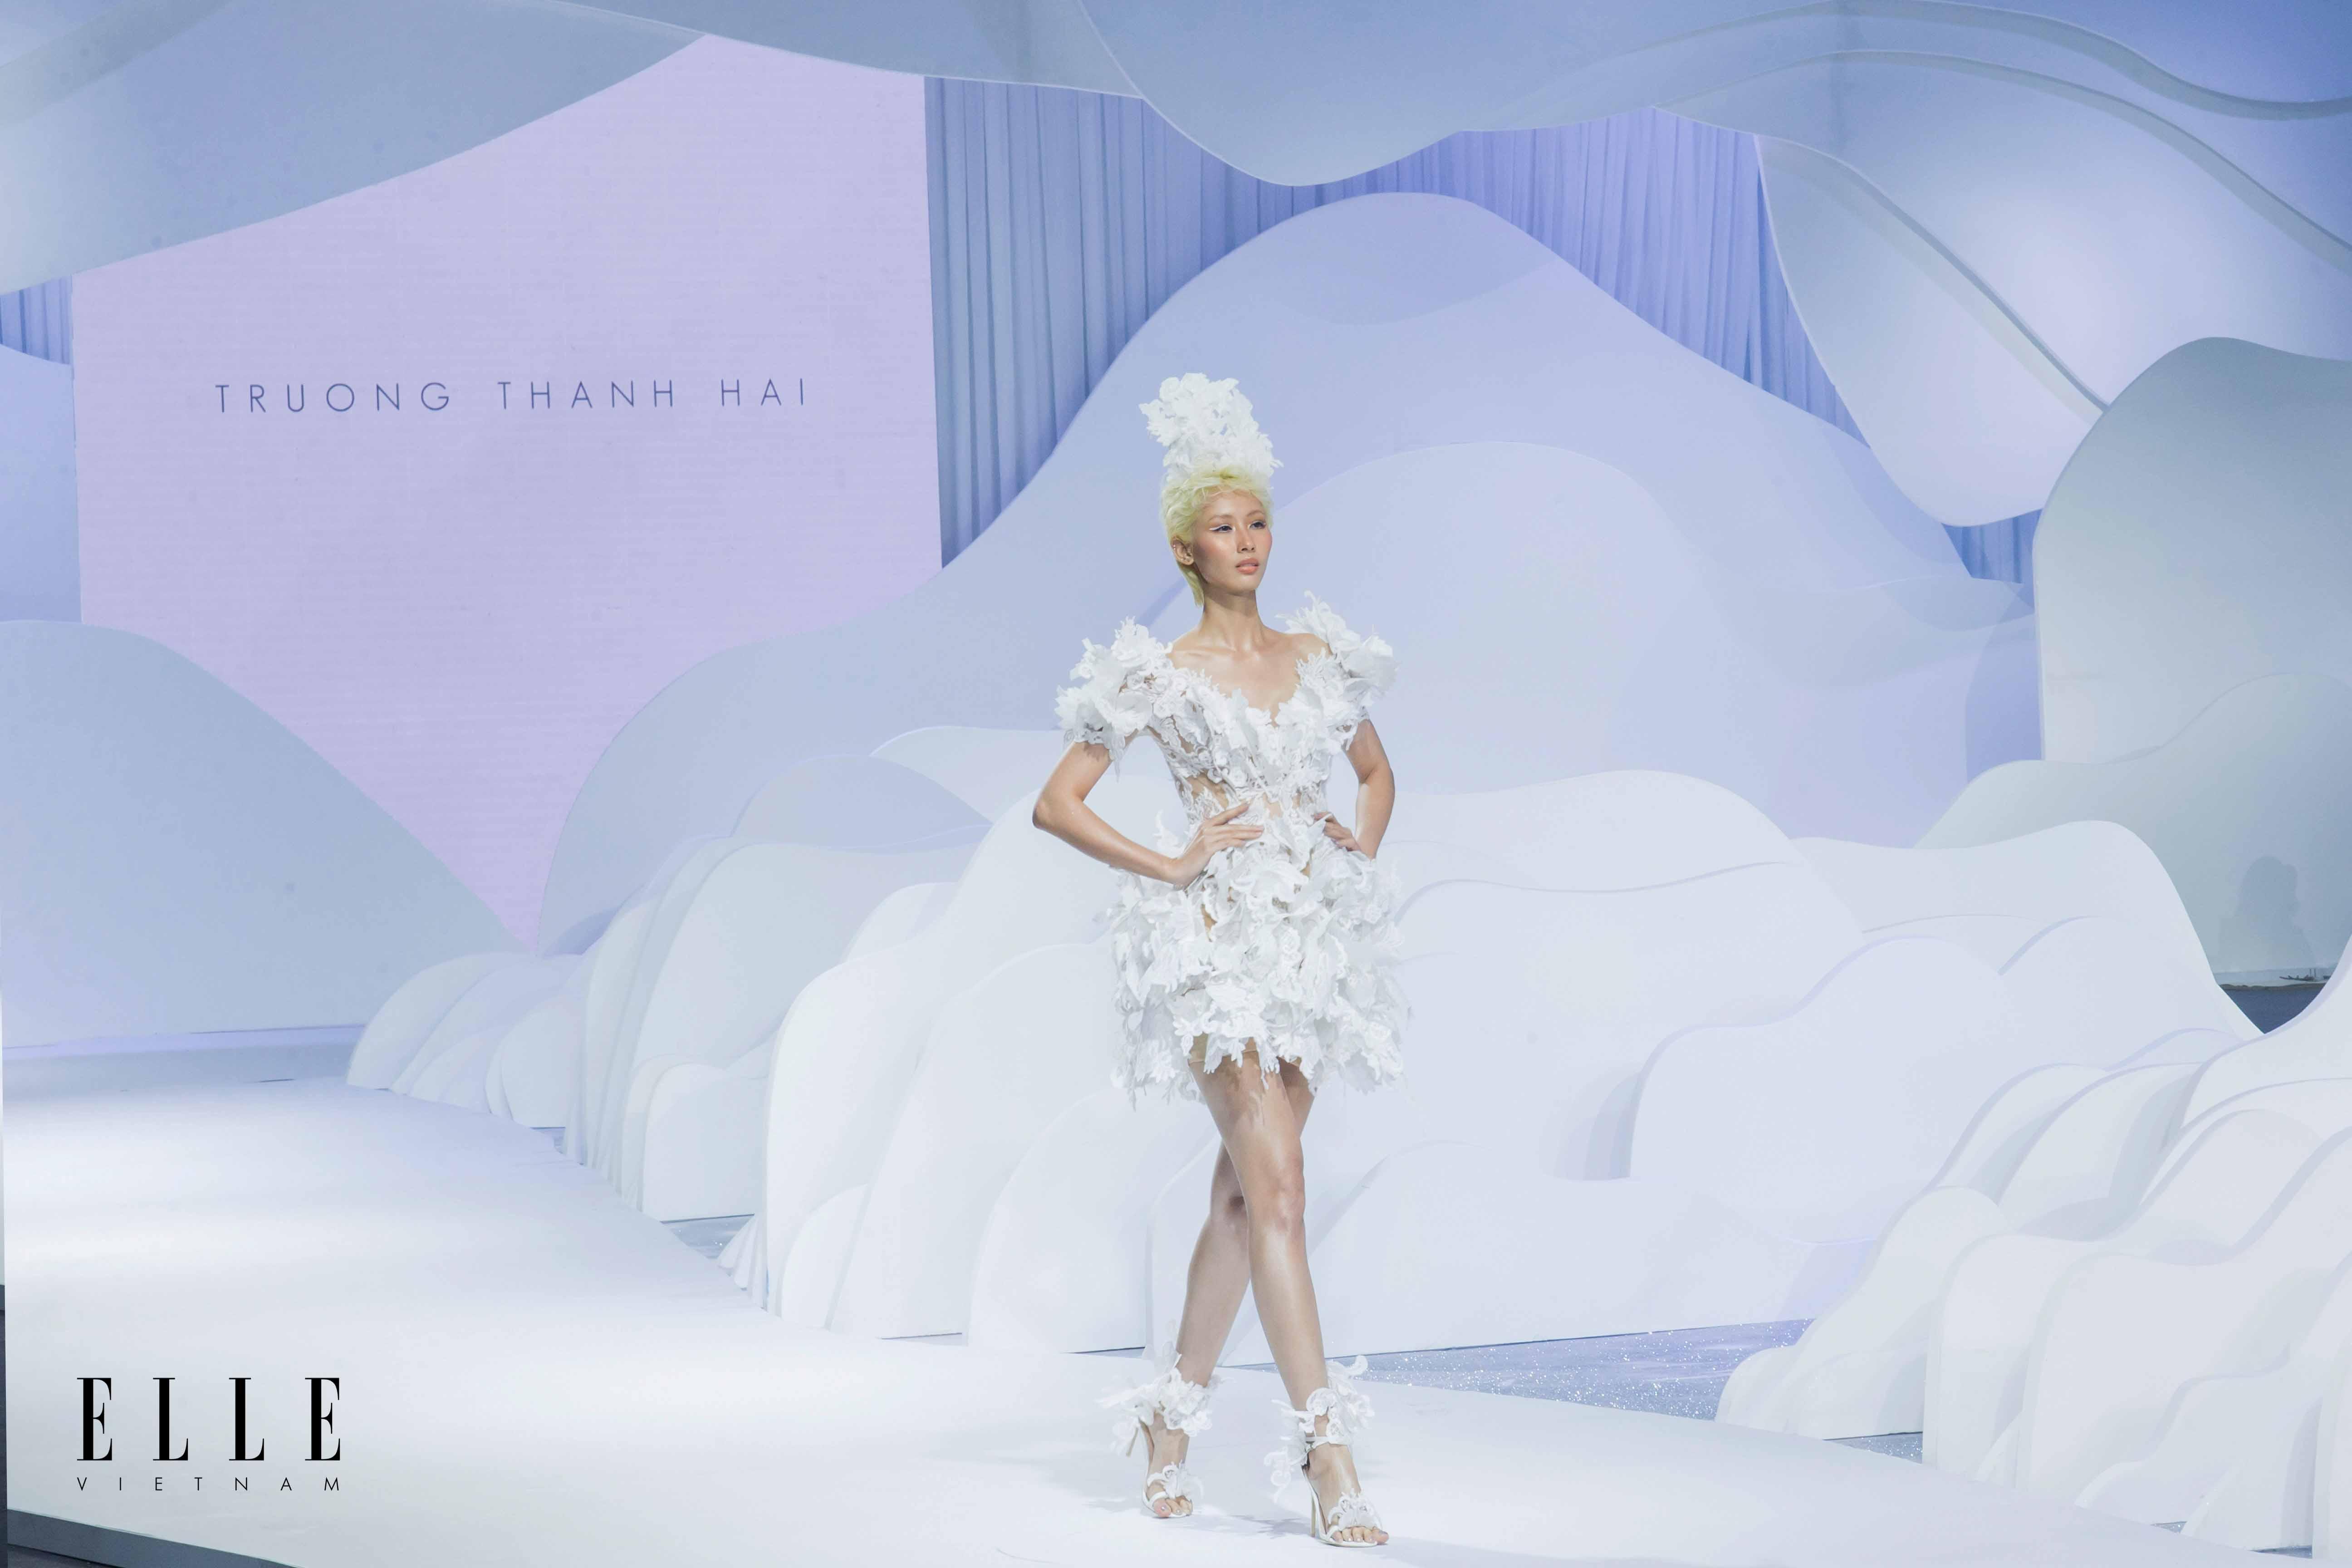 váy cưới ngắn bst trương thanh hải elle wedding art gallery 2020